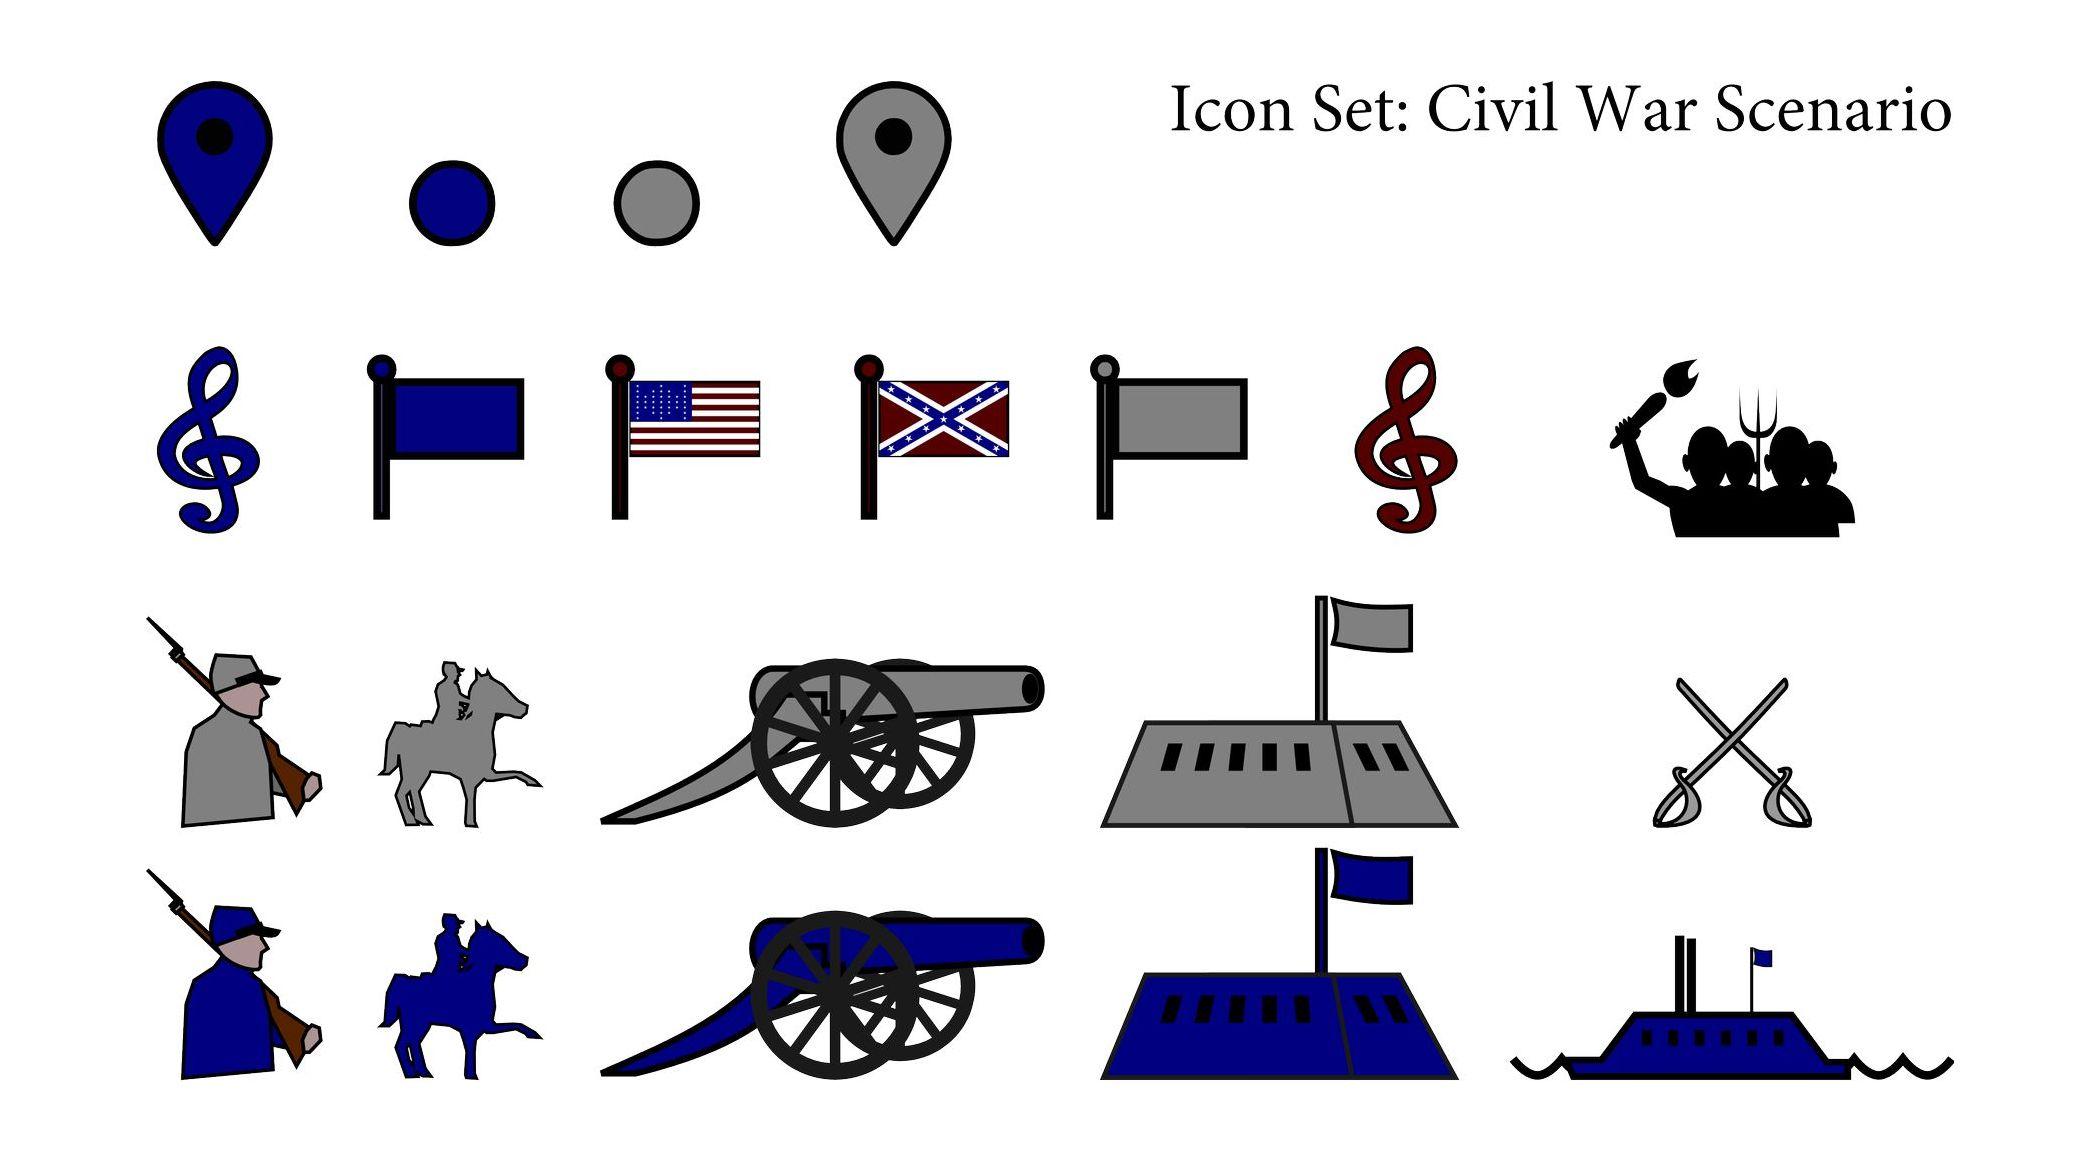 Icon Set: Civil War Scenario